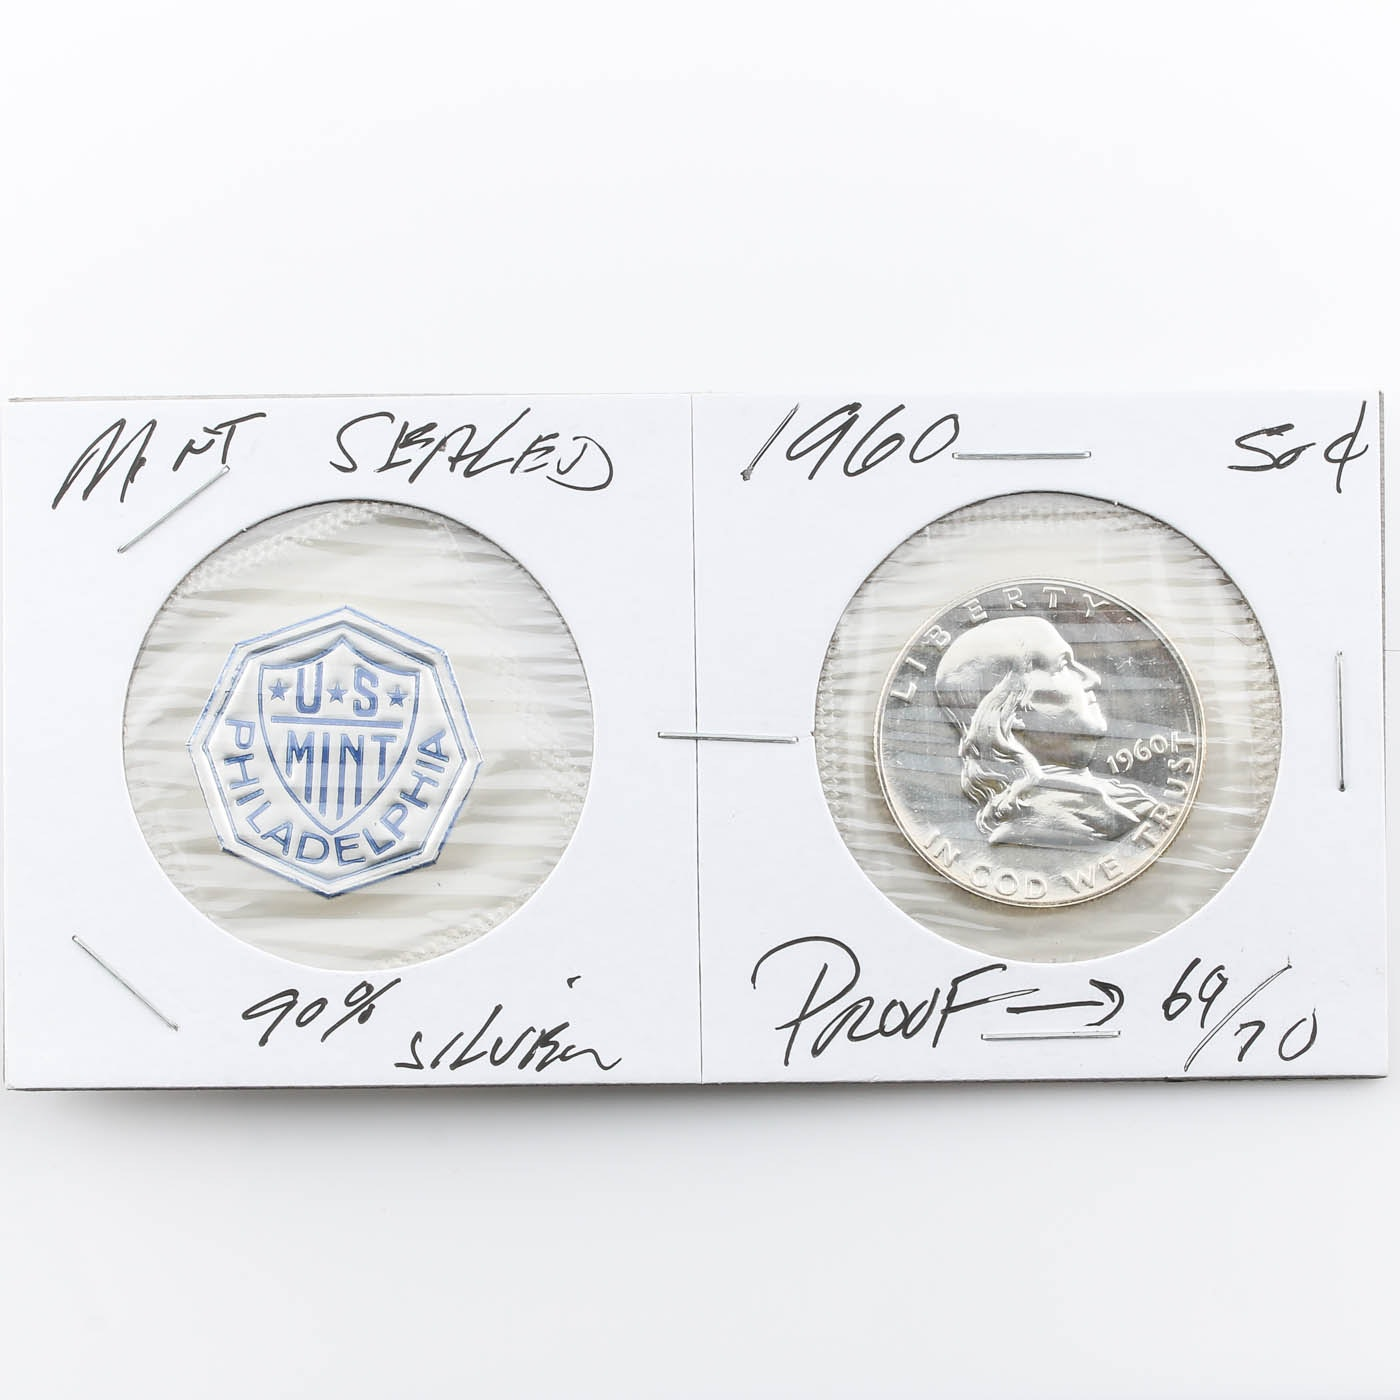 1960 Franklin Silver Half Dollar Proof Coin